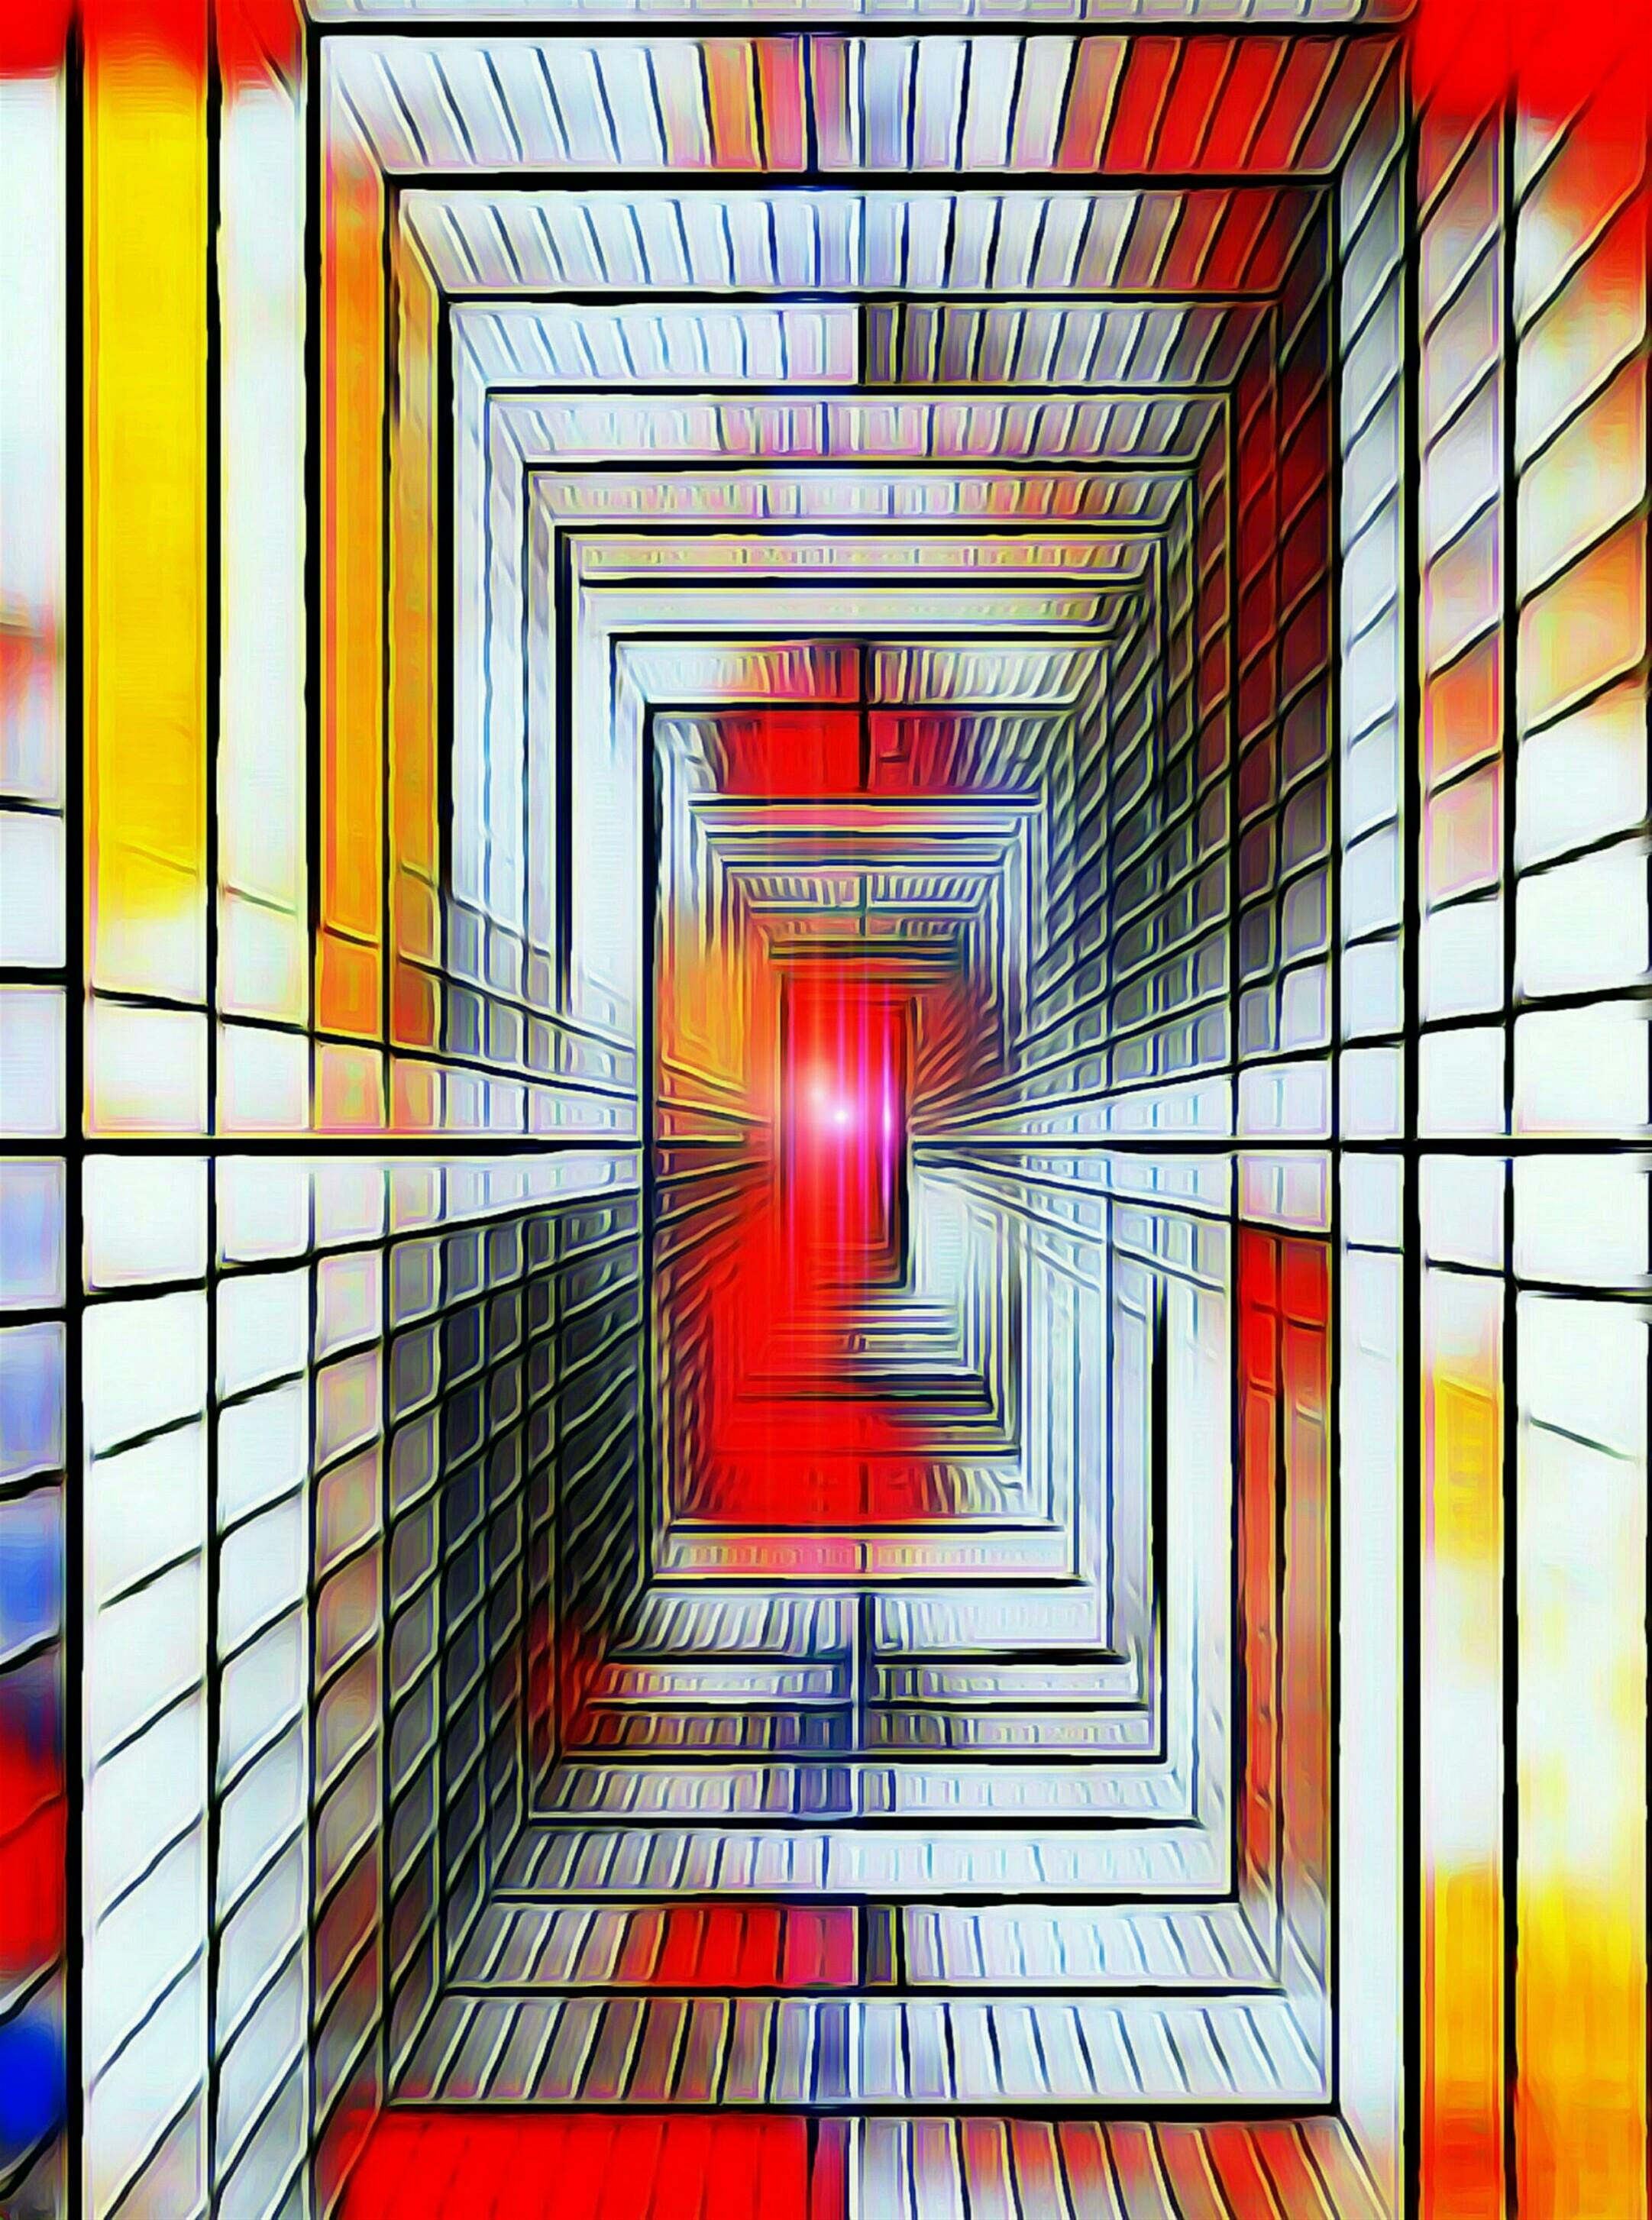 Mondrian clipart image royalty free stock freetoedit remix doubleexposure mondrian geometrical... image royalty free stock